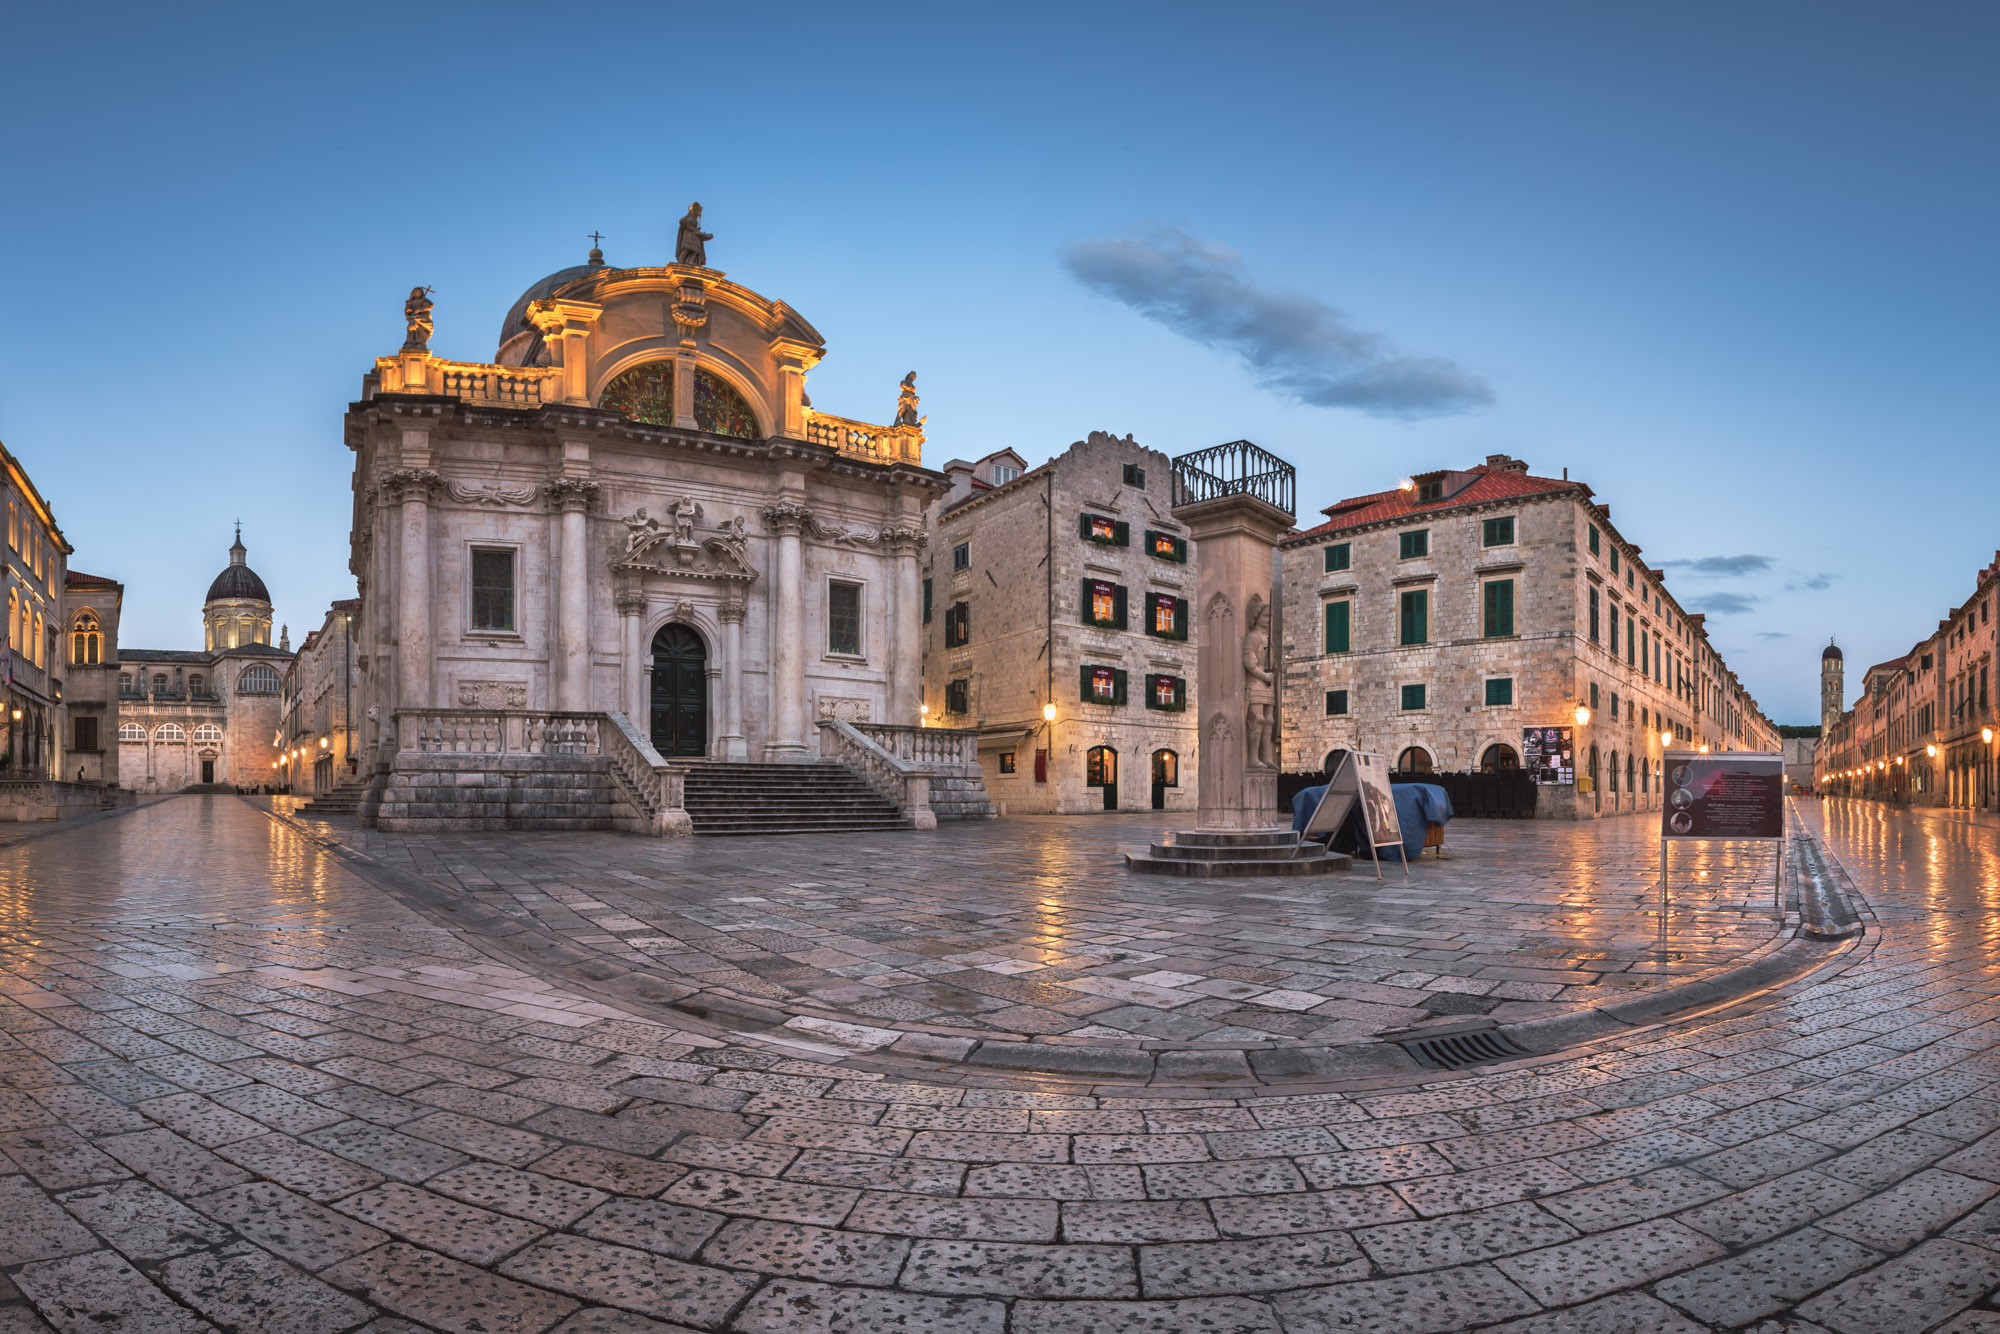 Luza Square and Saint Blaise Church in Dubrovnik, Croatia